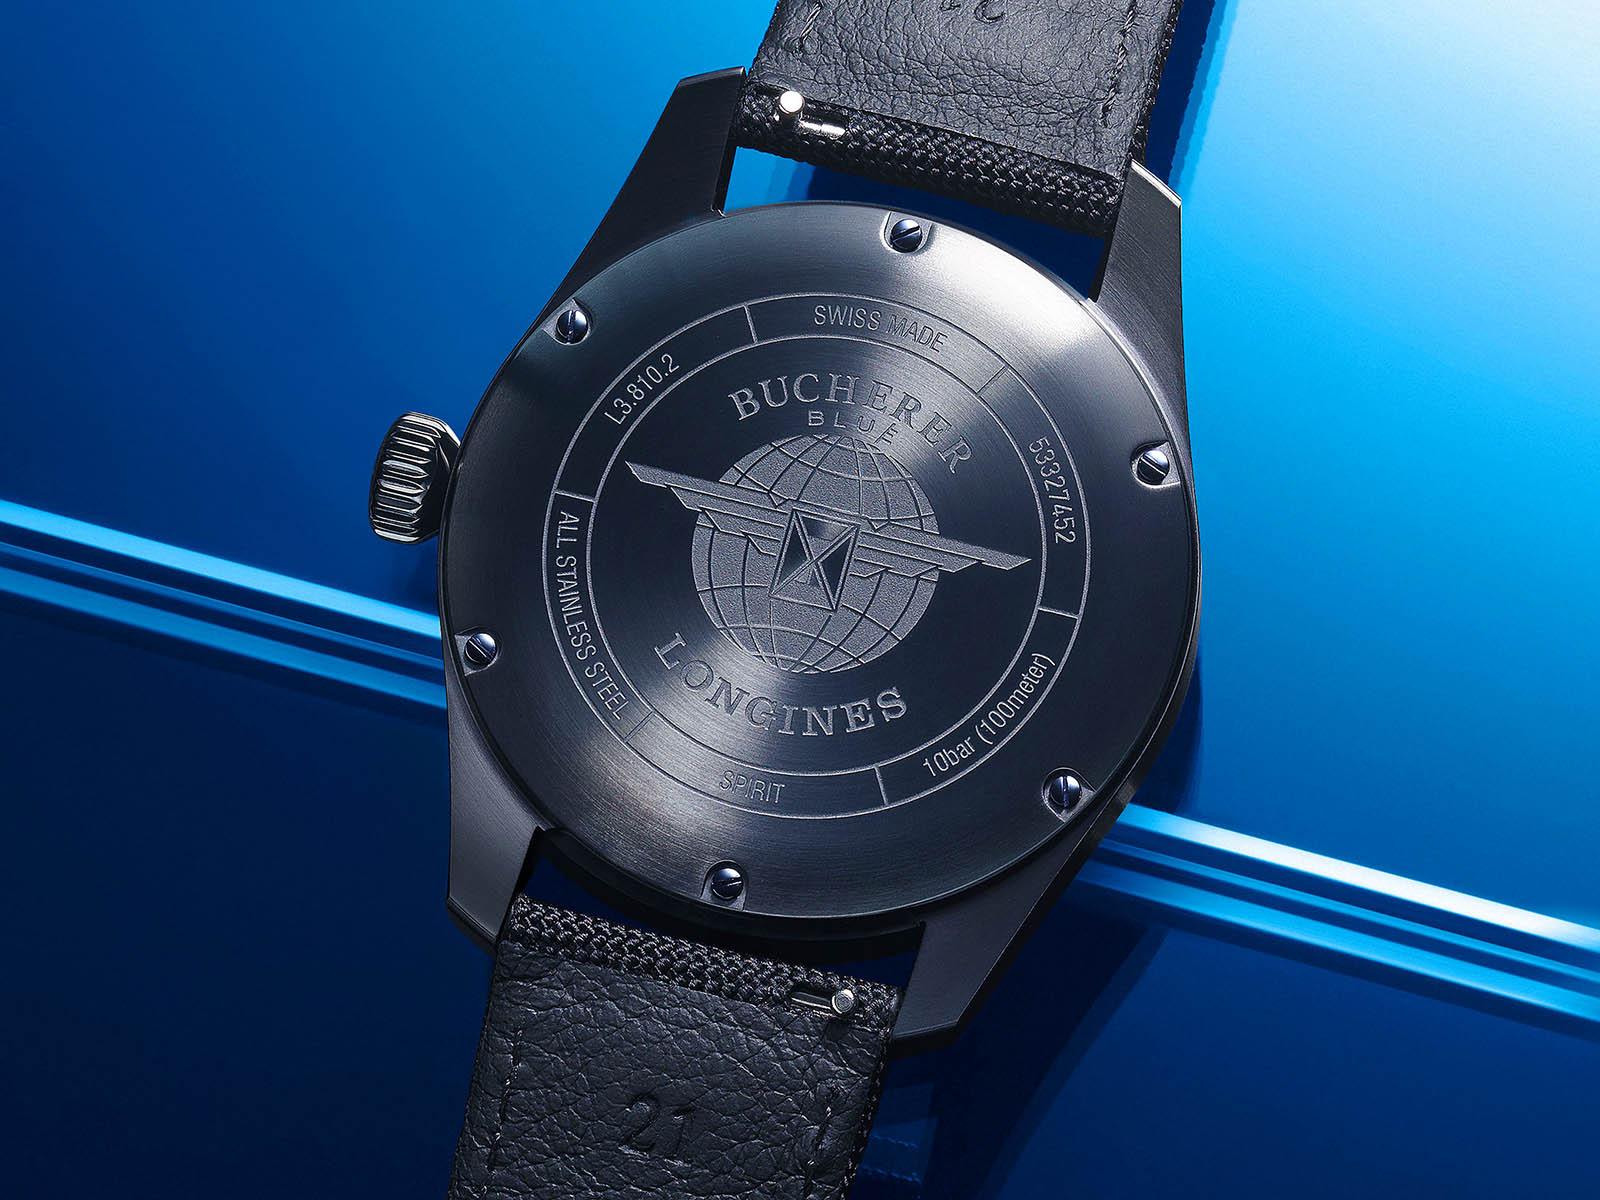 l3-810-2-99-2-longines-spirit-bucherer-blue-automatic-3.jpg